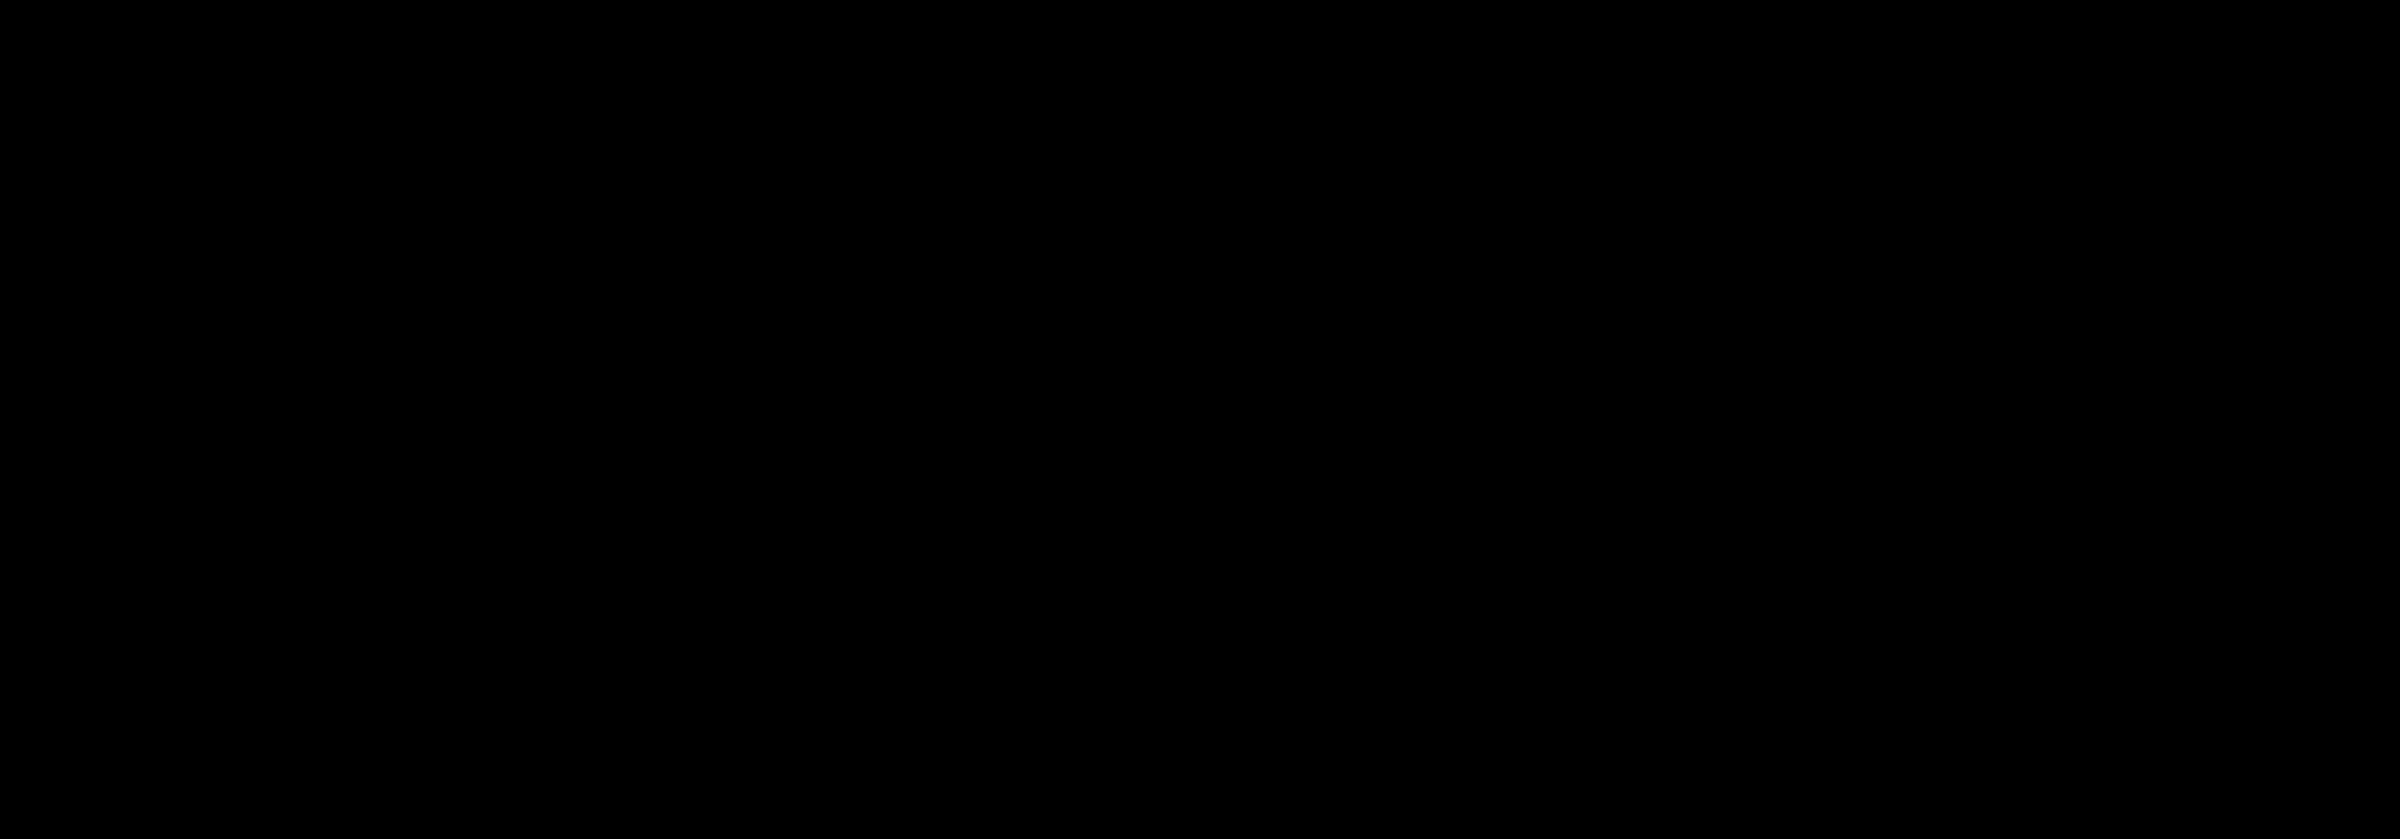 2400x839 Clipart